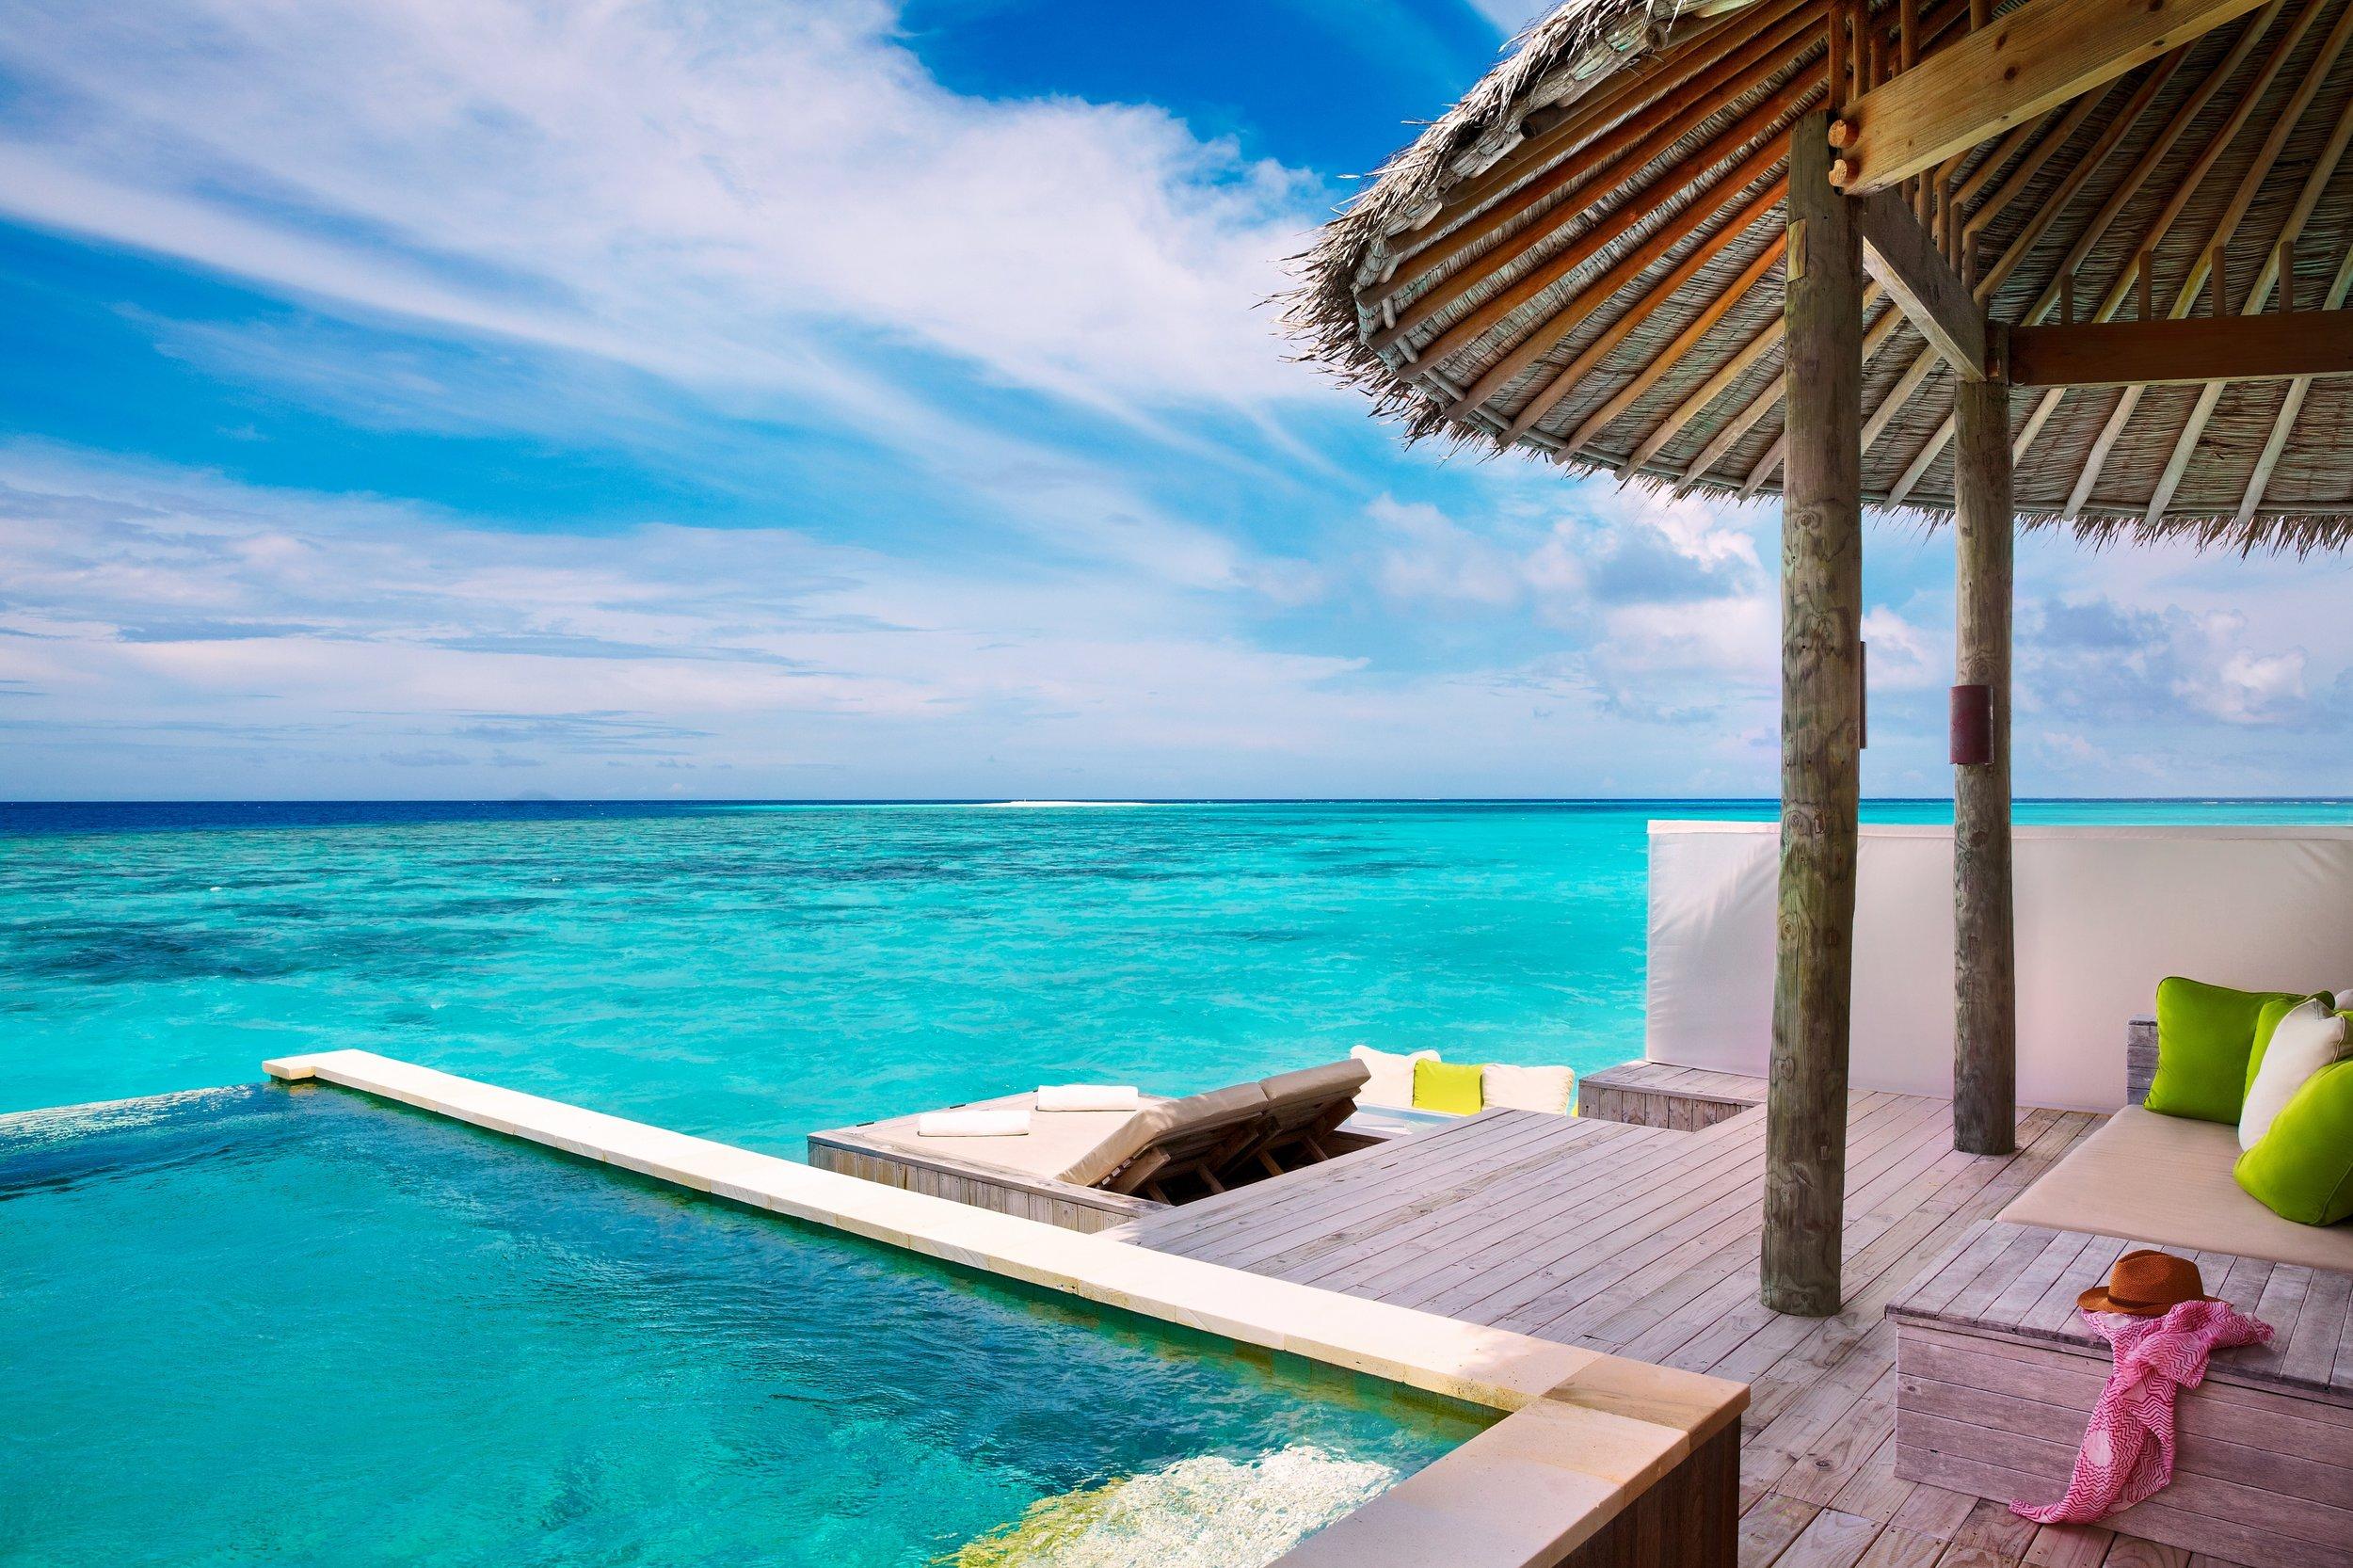 Laamu_Water_Villa_with_Pool_deck_[6037-A4].jpg